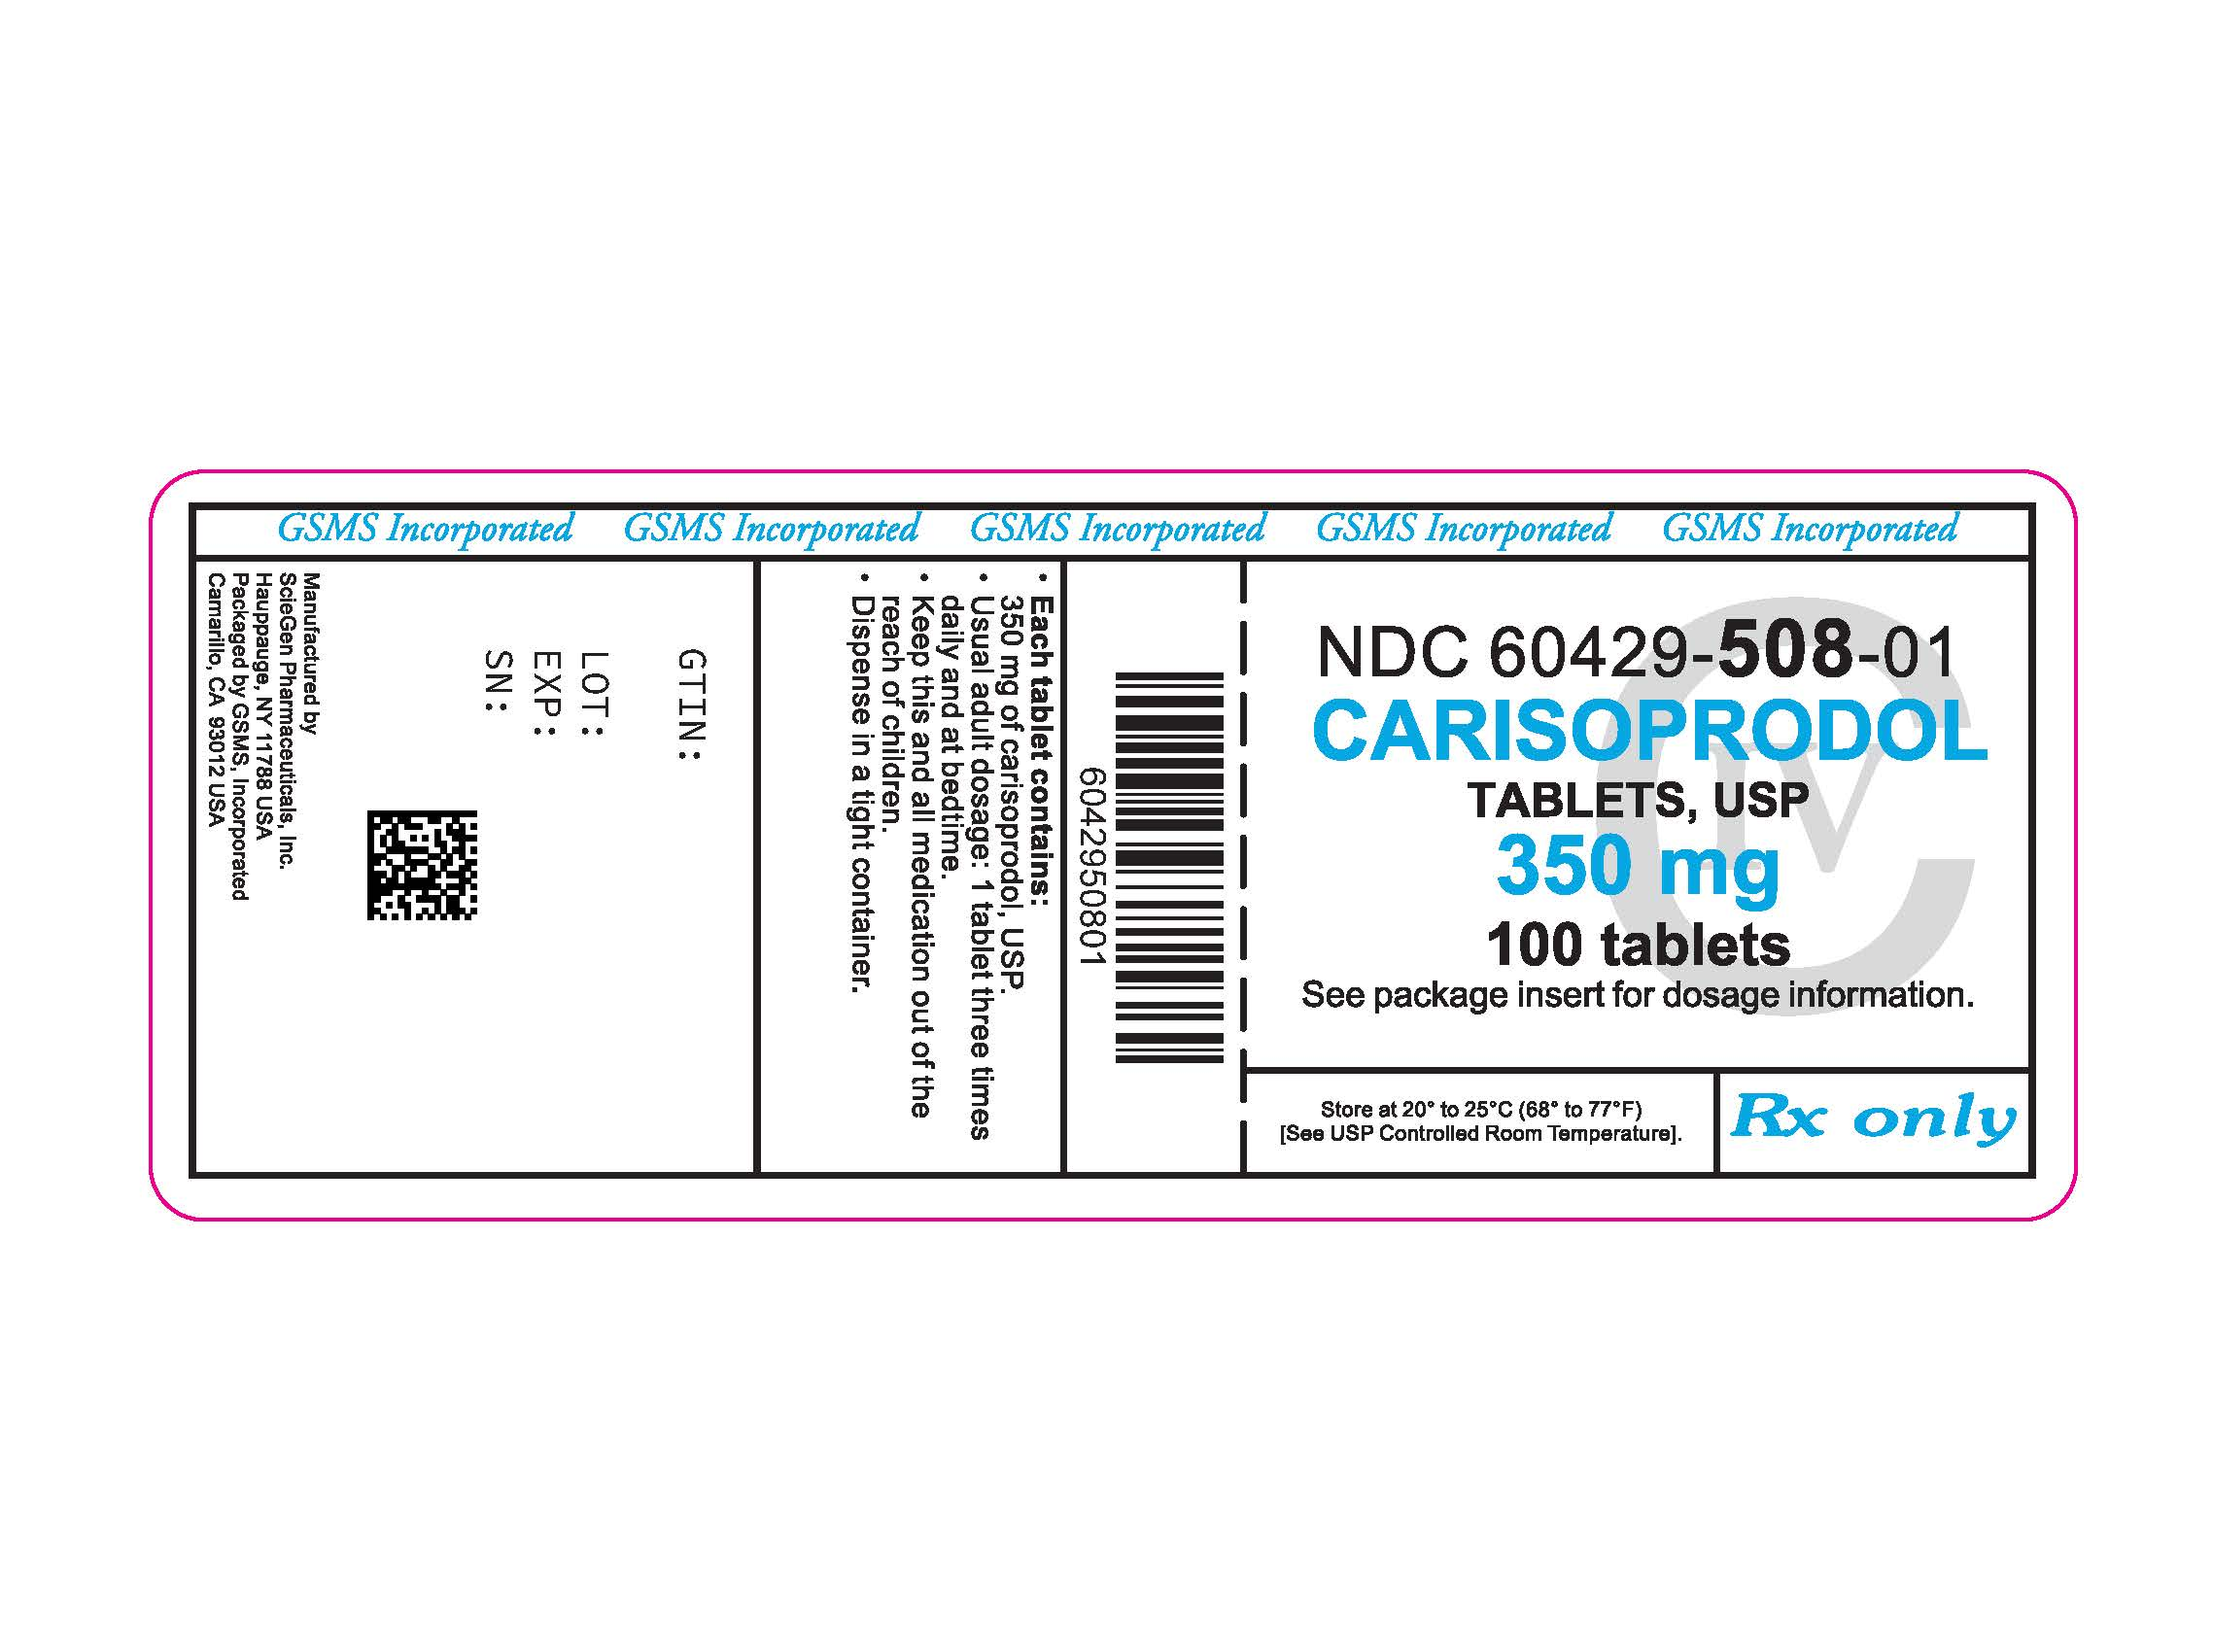 60429-508-01LB - CARISOPRODOL 350 MG TABS - CIV - REV APR 2014.jpg